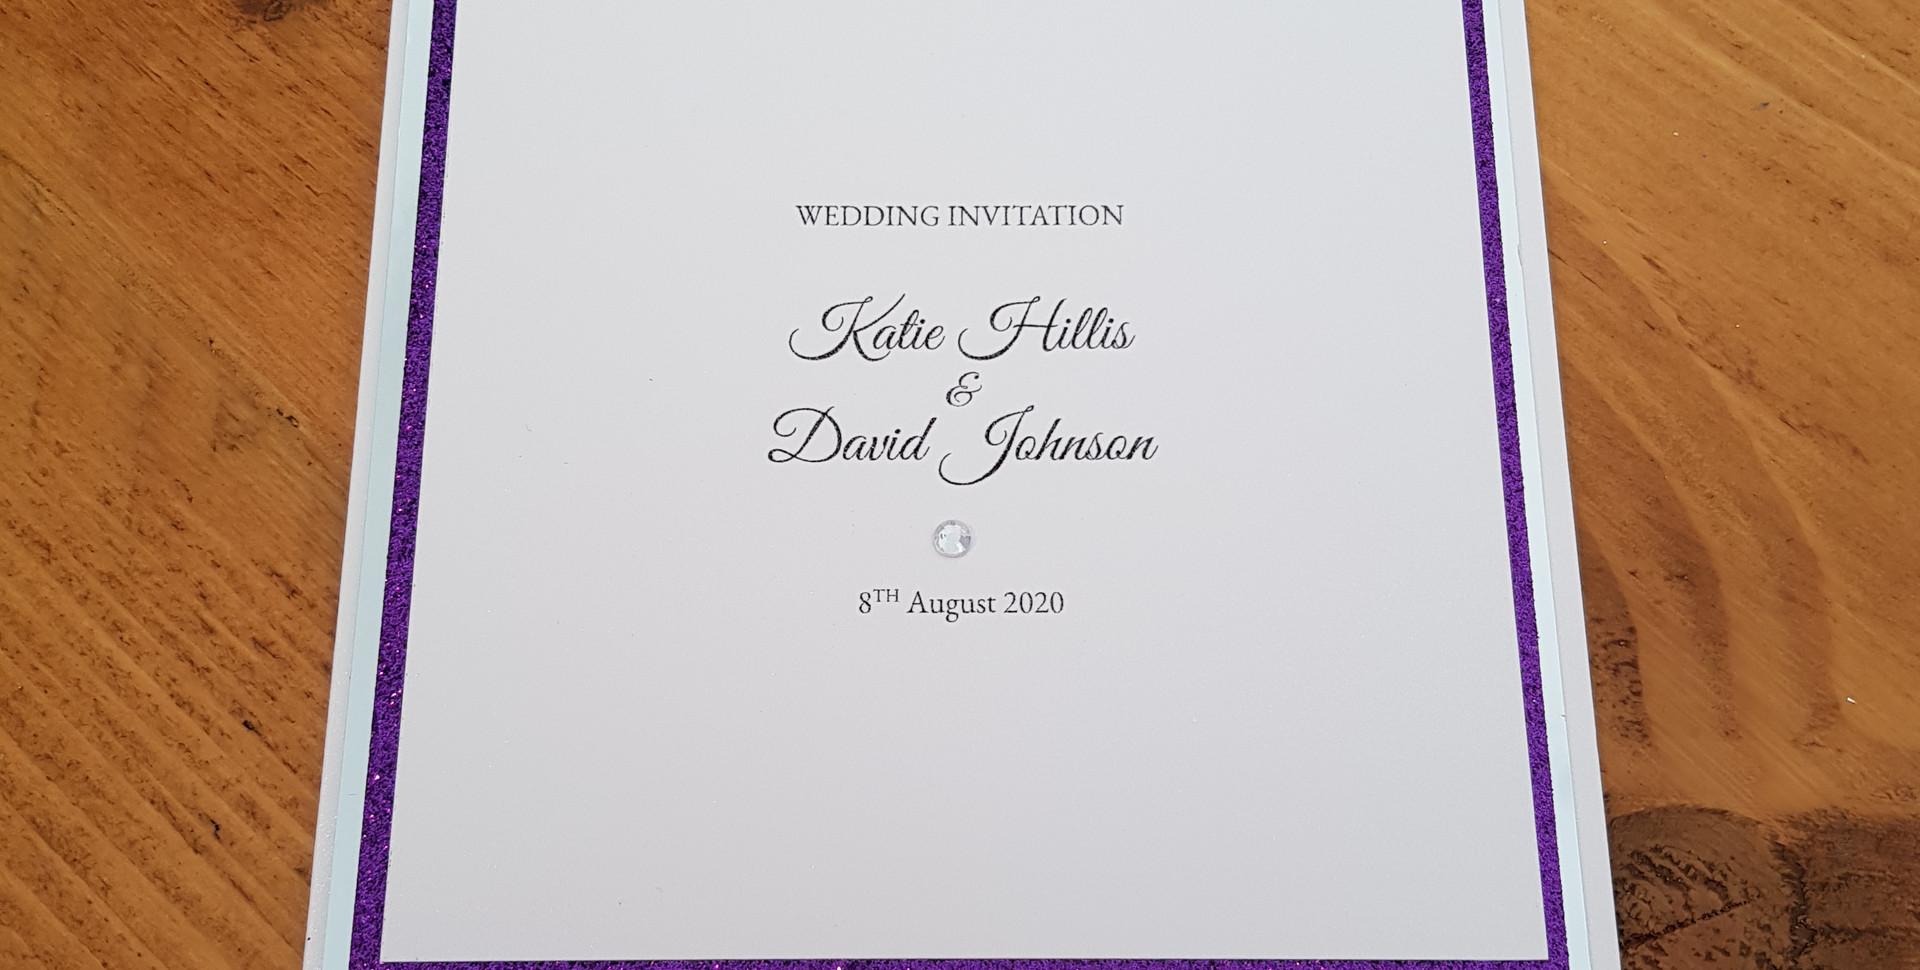 Katie - Day wedding invitations